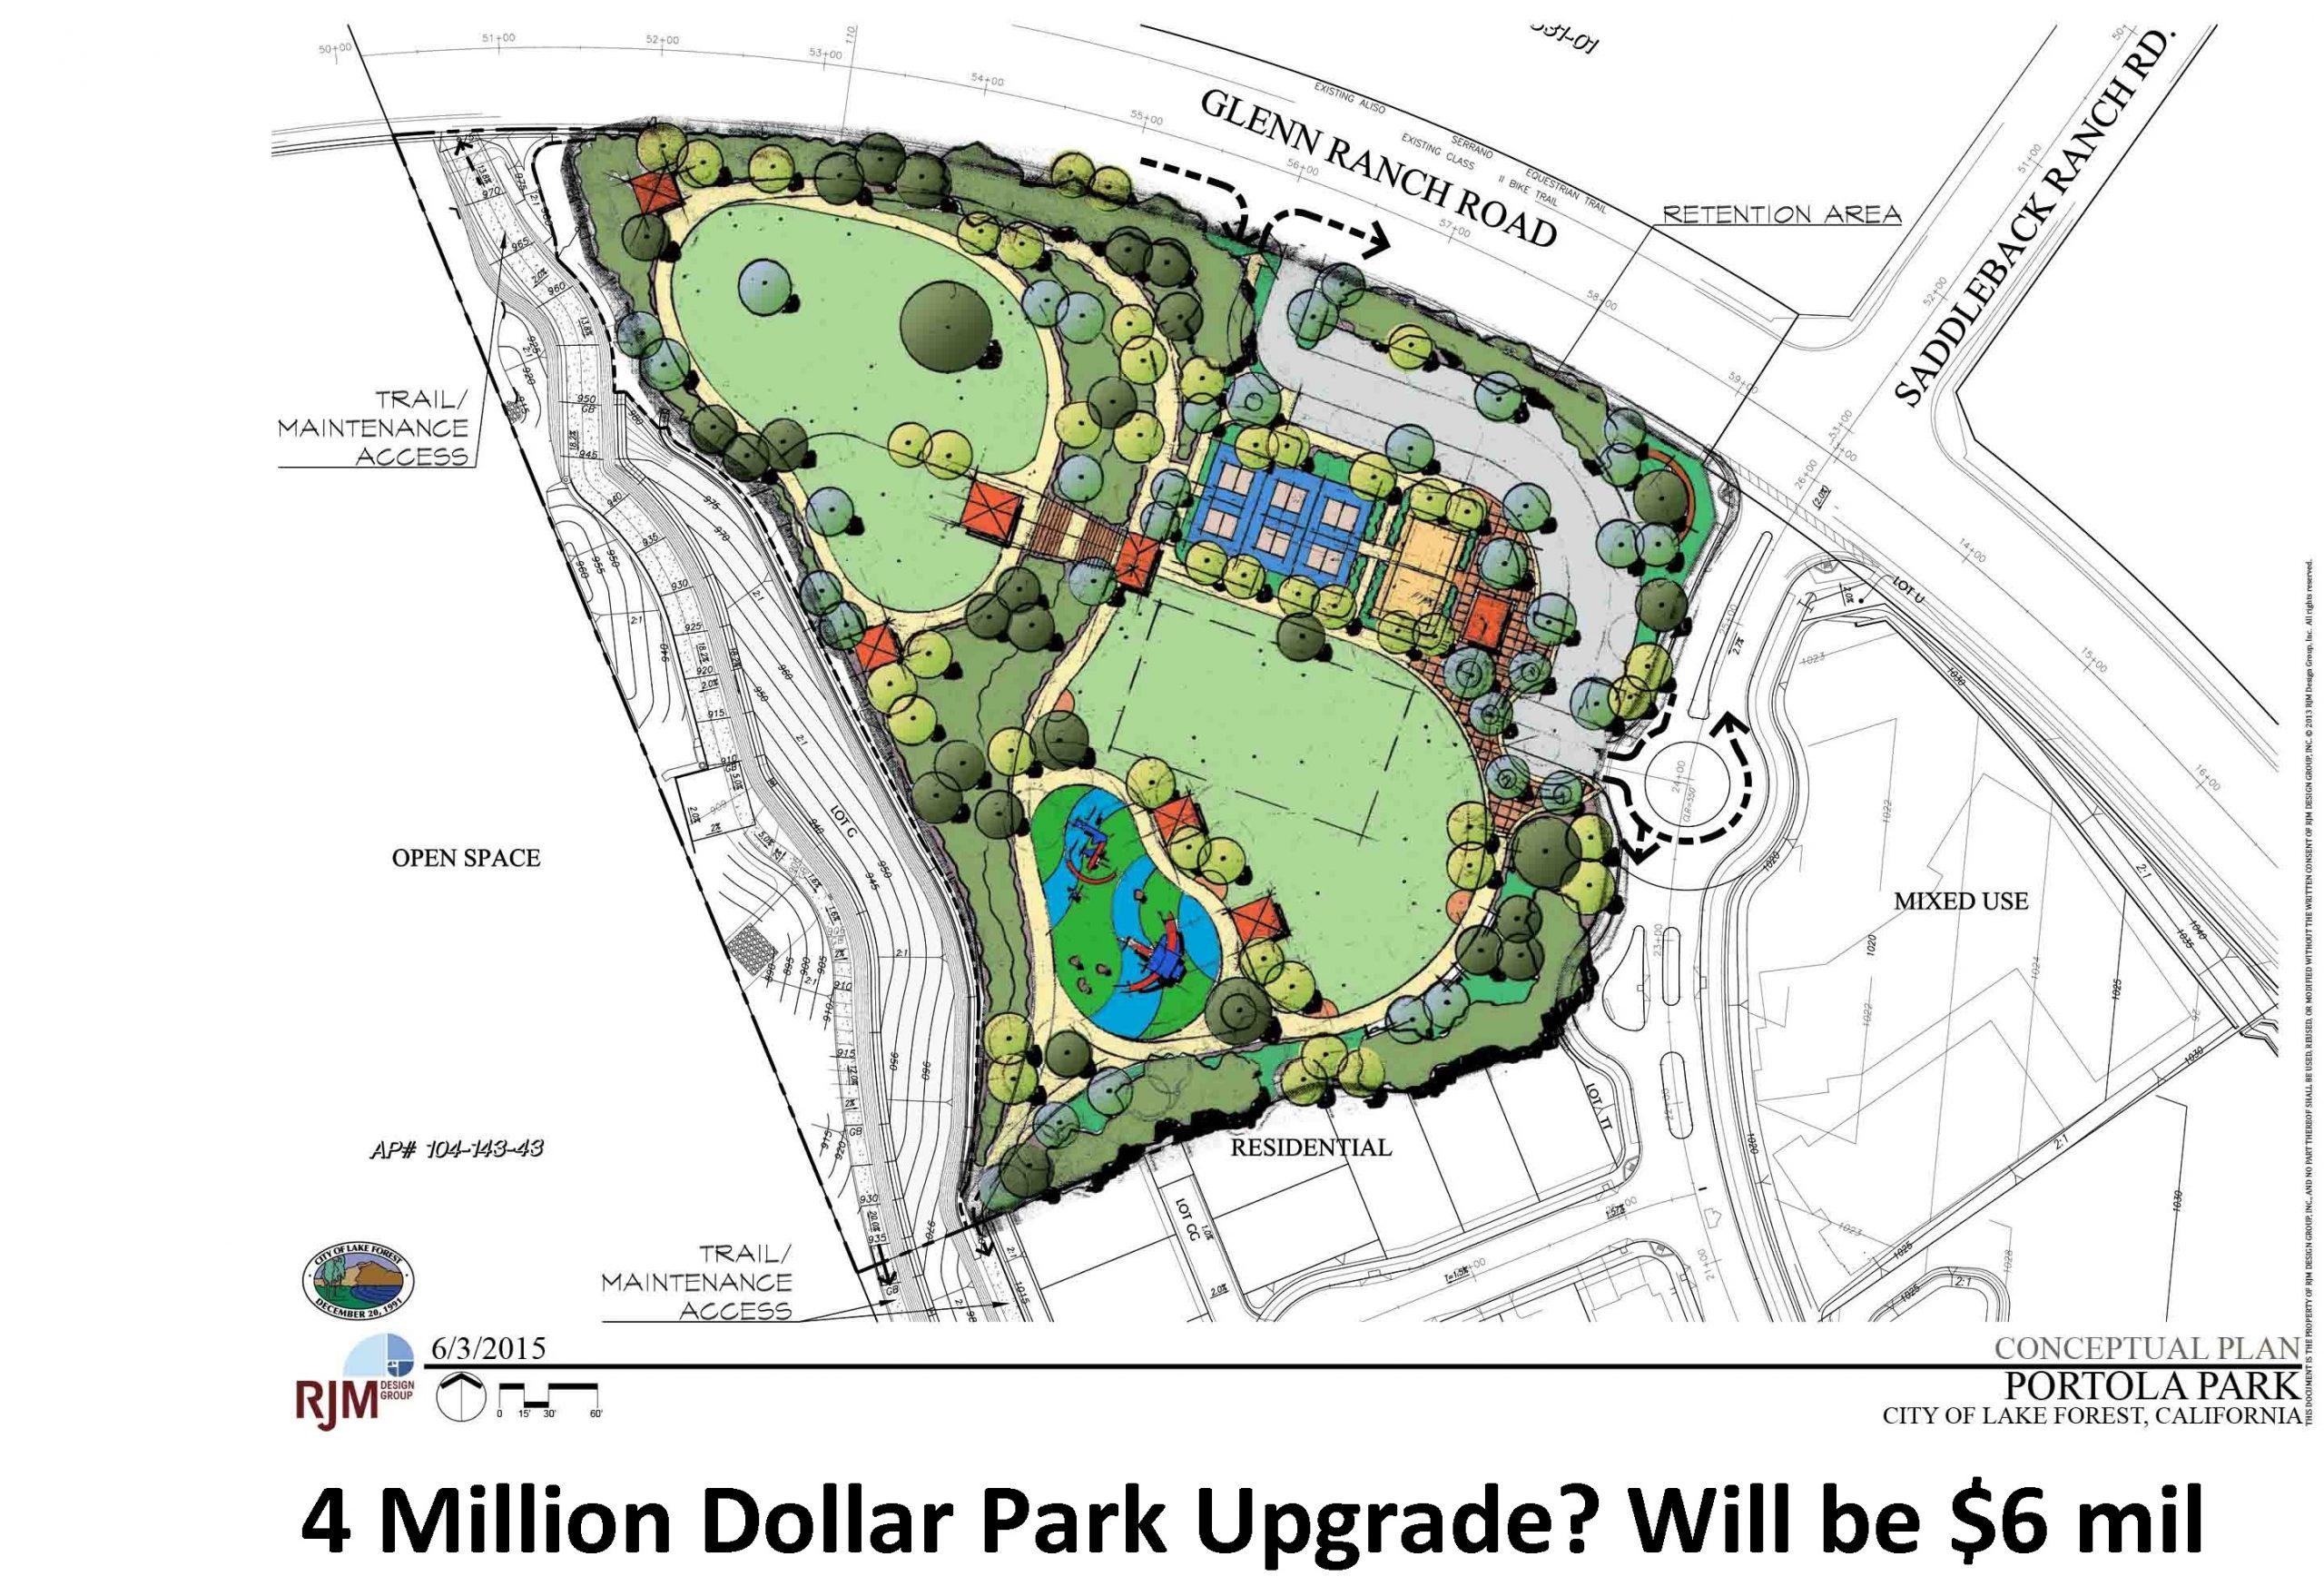 $4 Milon Dollar Park Upgrade